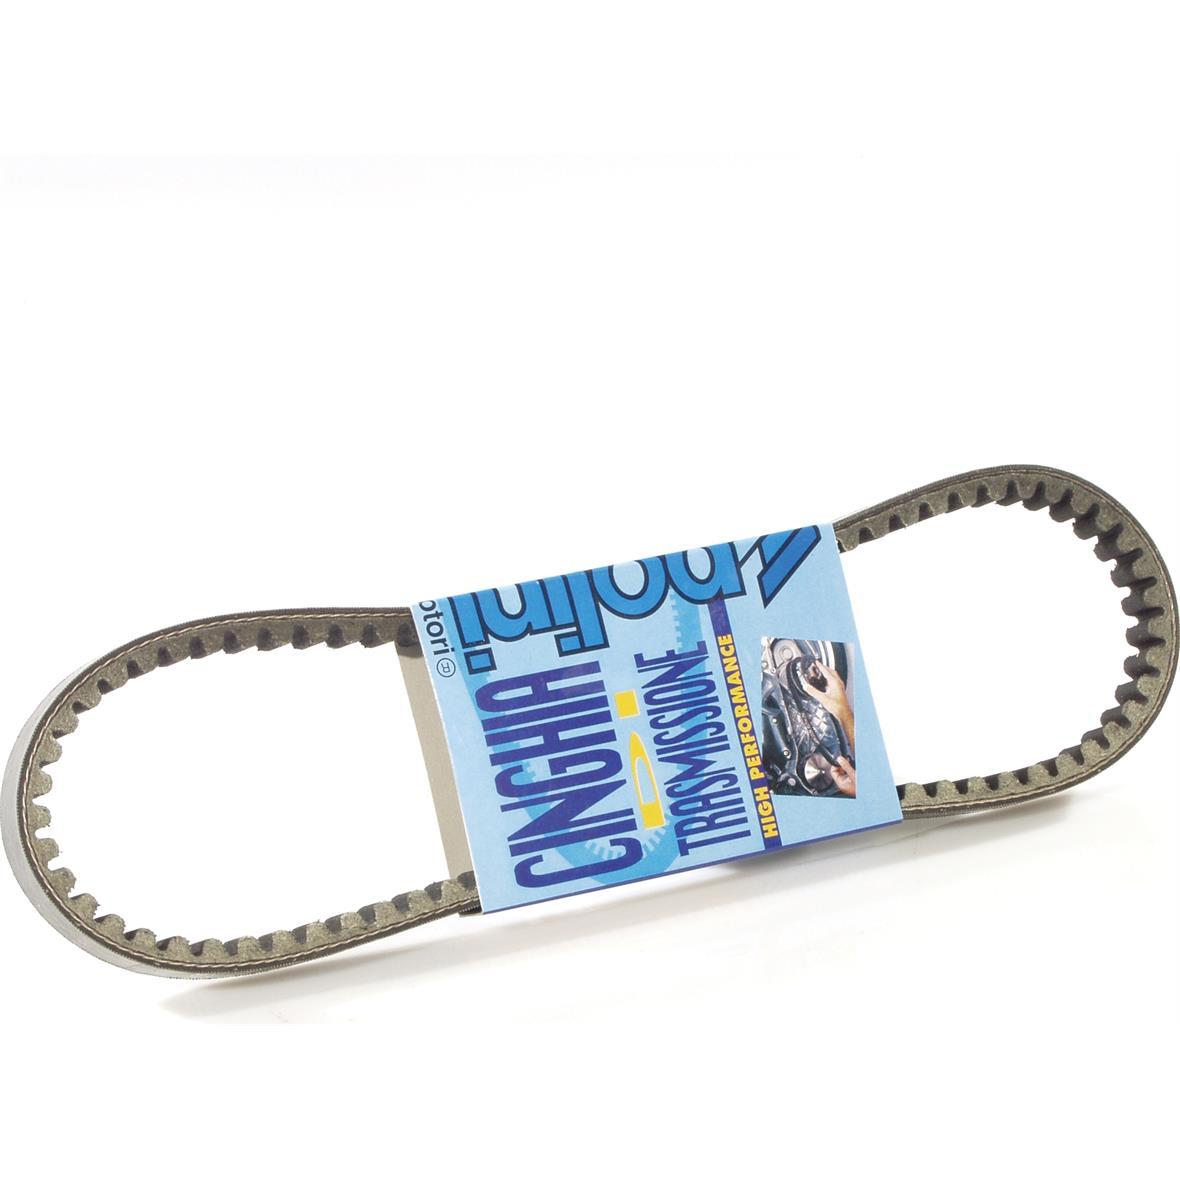 Product Image for 'Belt POLINI OriginalTitle'